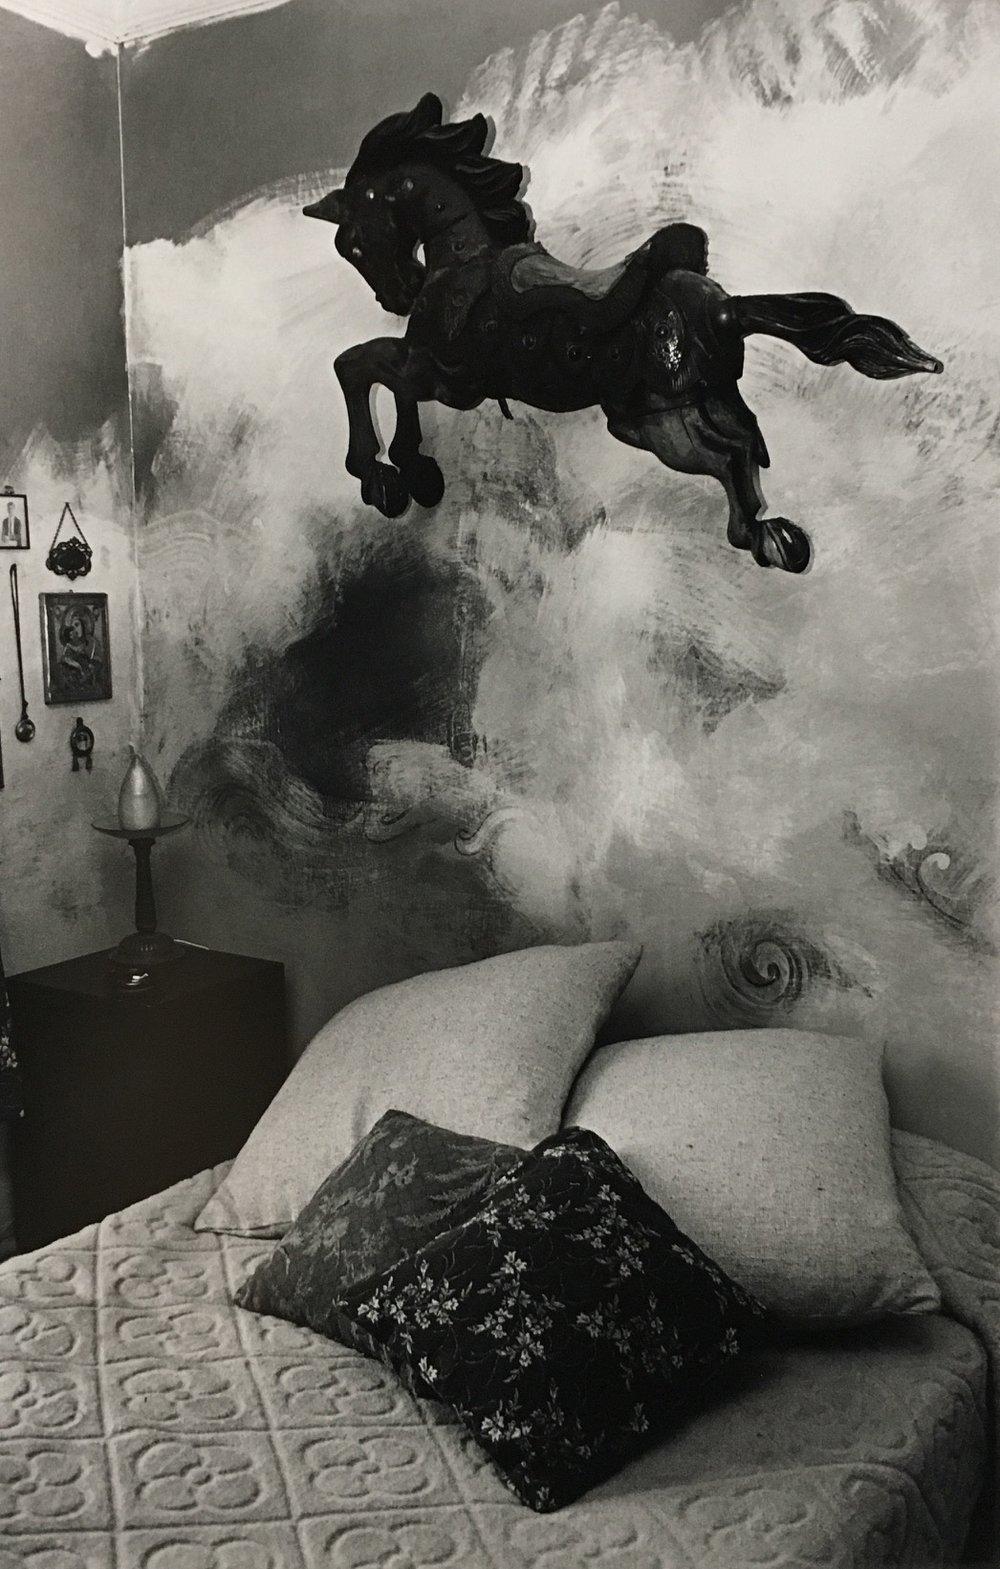 Yolanda Andrade,El Caballito,1988 Gelatin silver print 24 x 20 inches $800